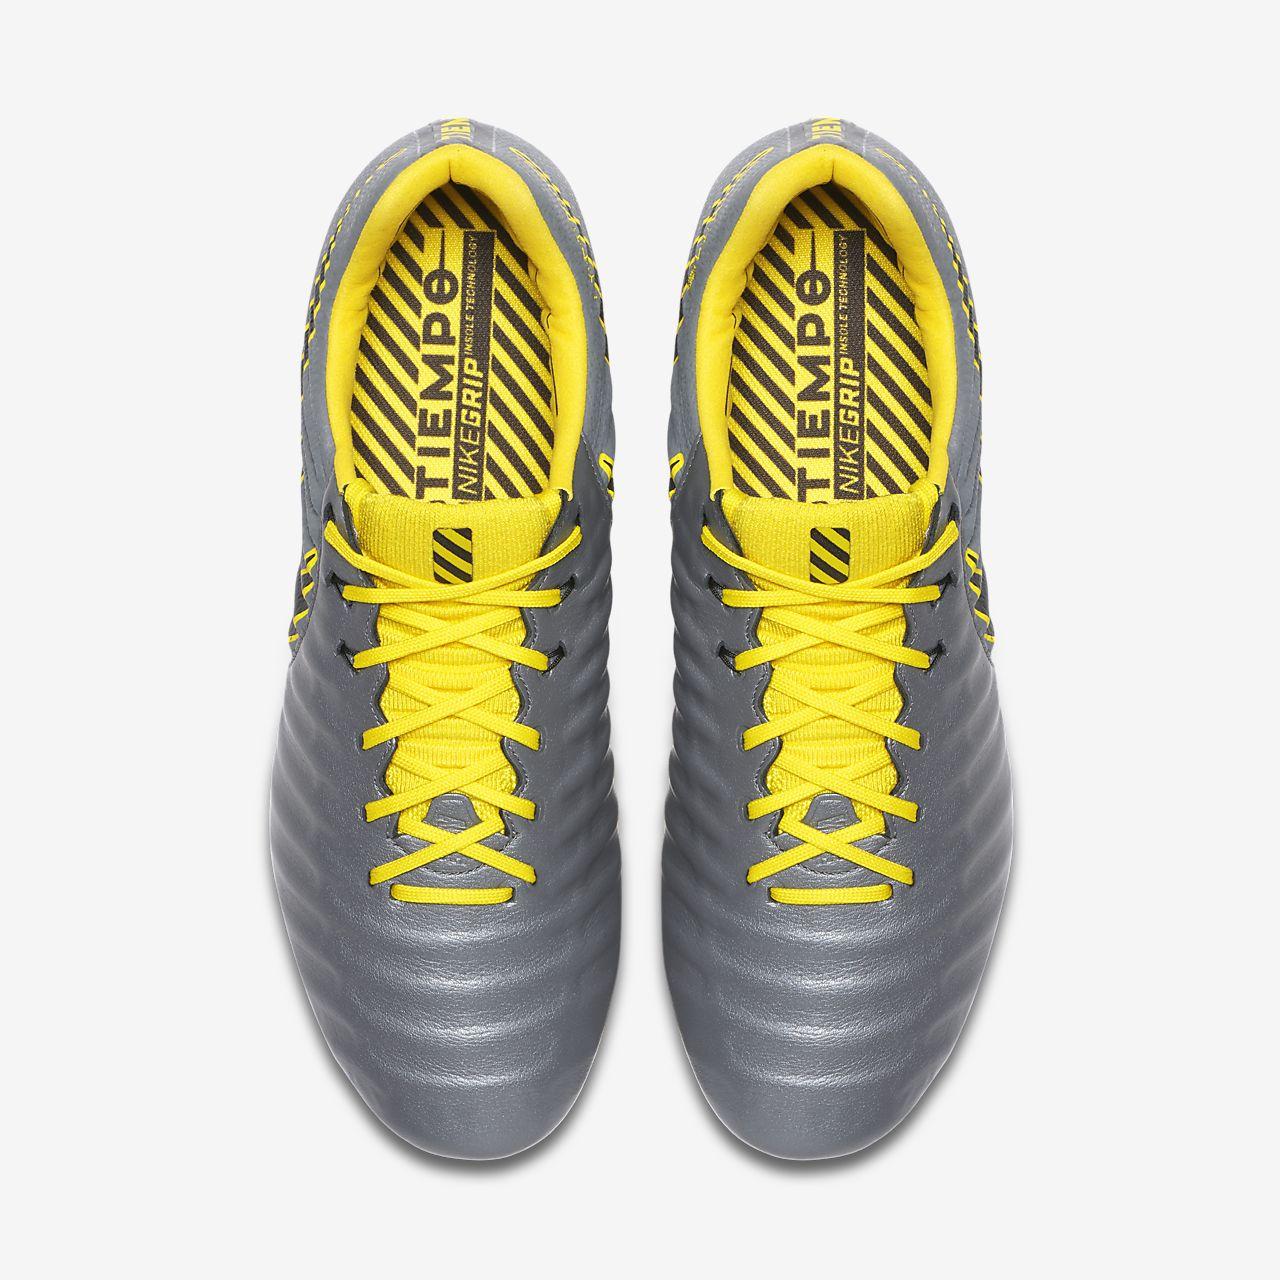 À Pour Gras Nike Chaussure Football Crampons De Terrain Tiempo 7f6IYbyvmg